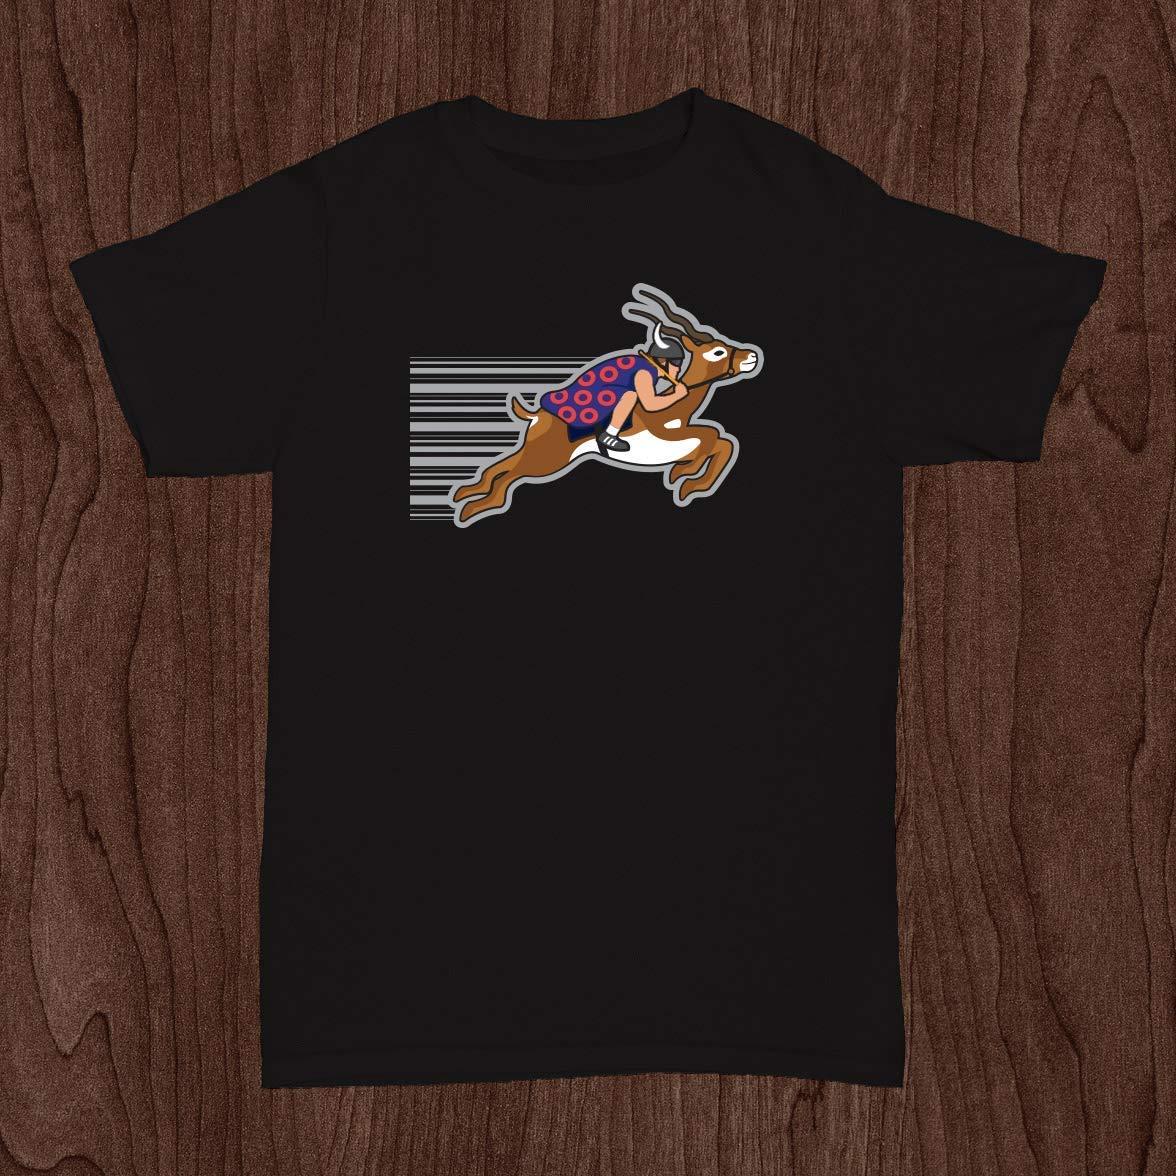 Translated Phish - Racing Antelope Retro Vintage Shirt Lot For Gift Dallas Mall T-Shirt